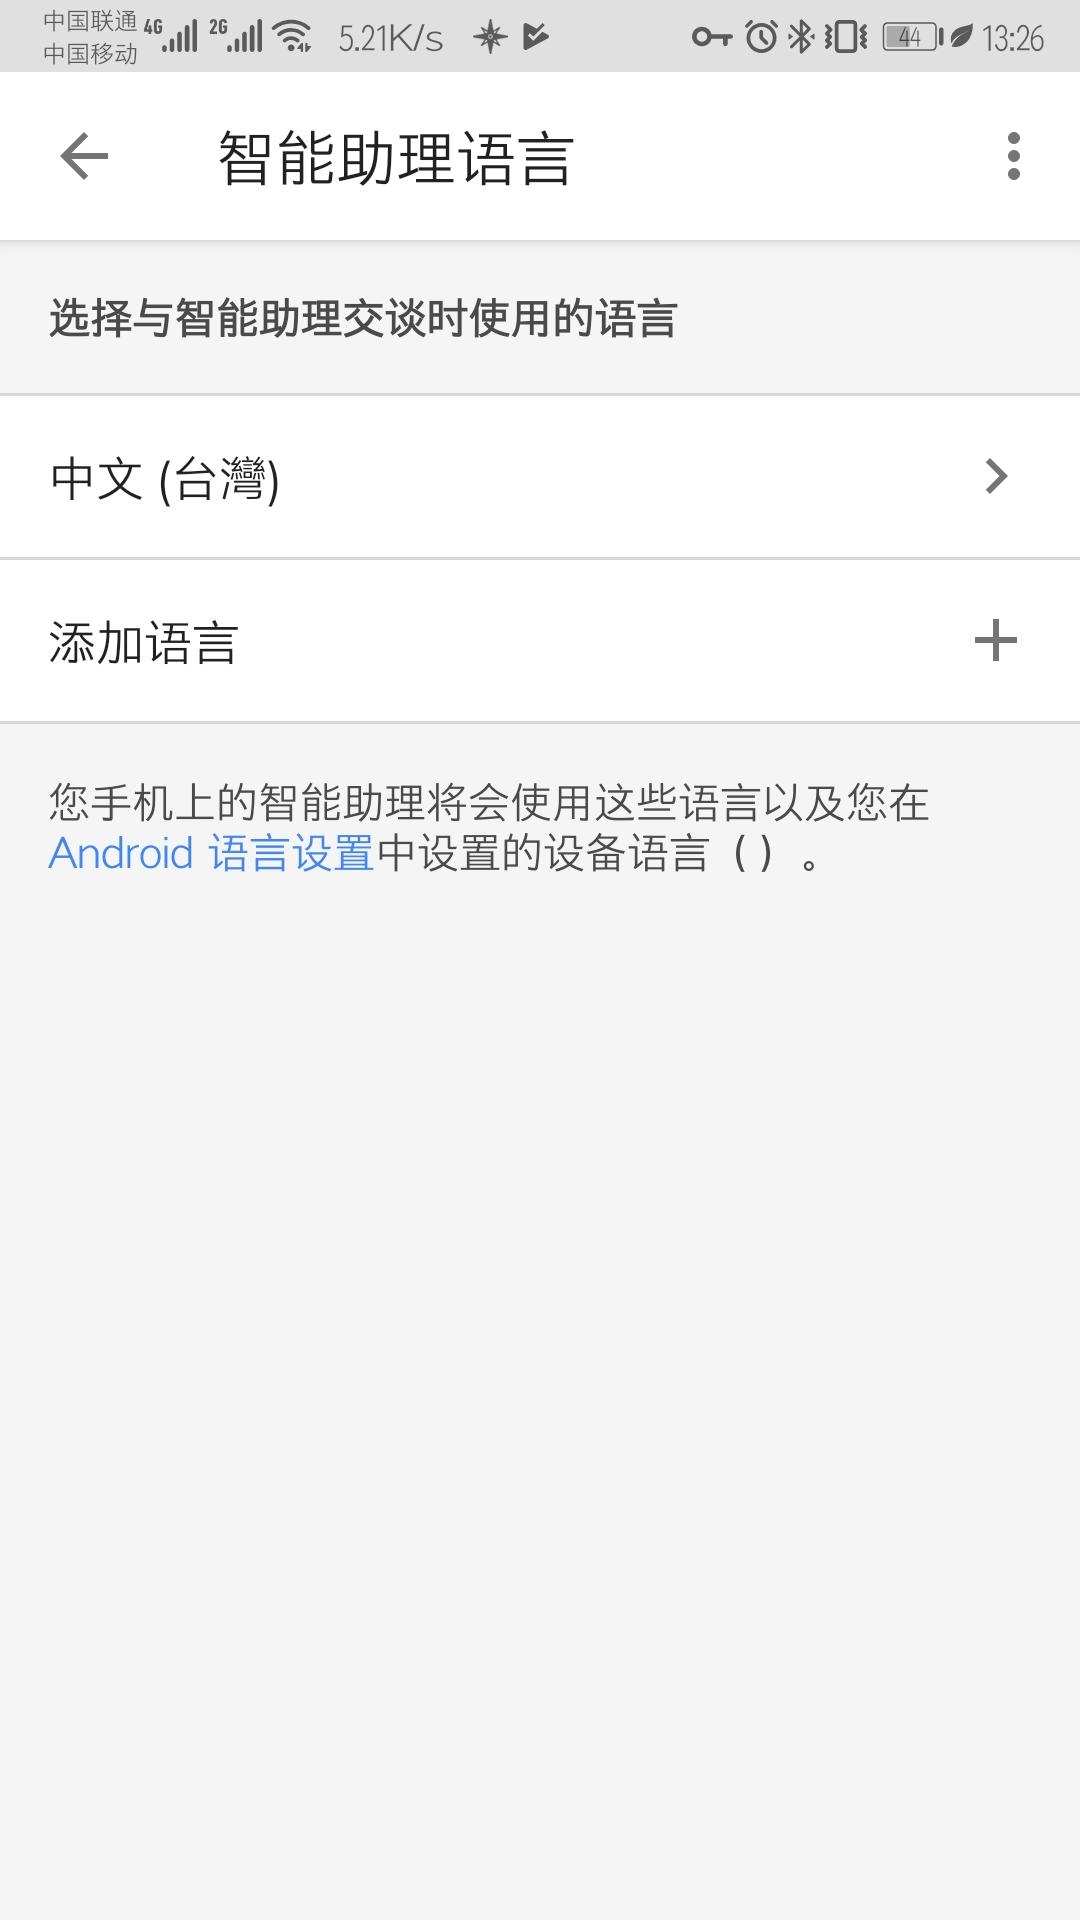 Screenshot_20190510_132644_com.google.android.goo.jpg